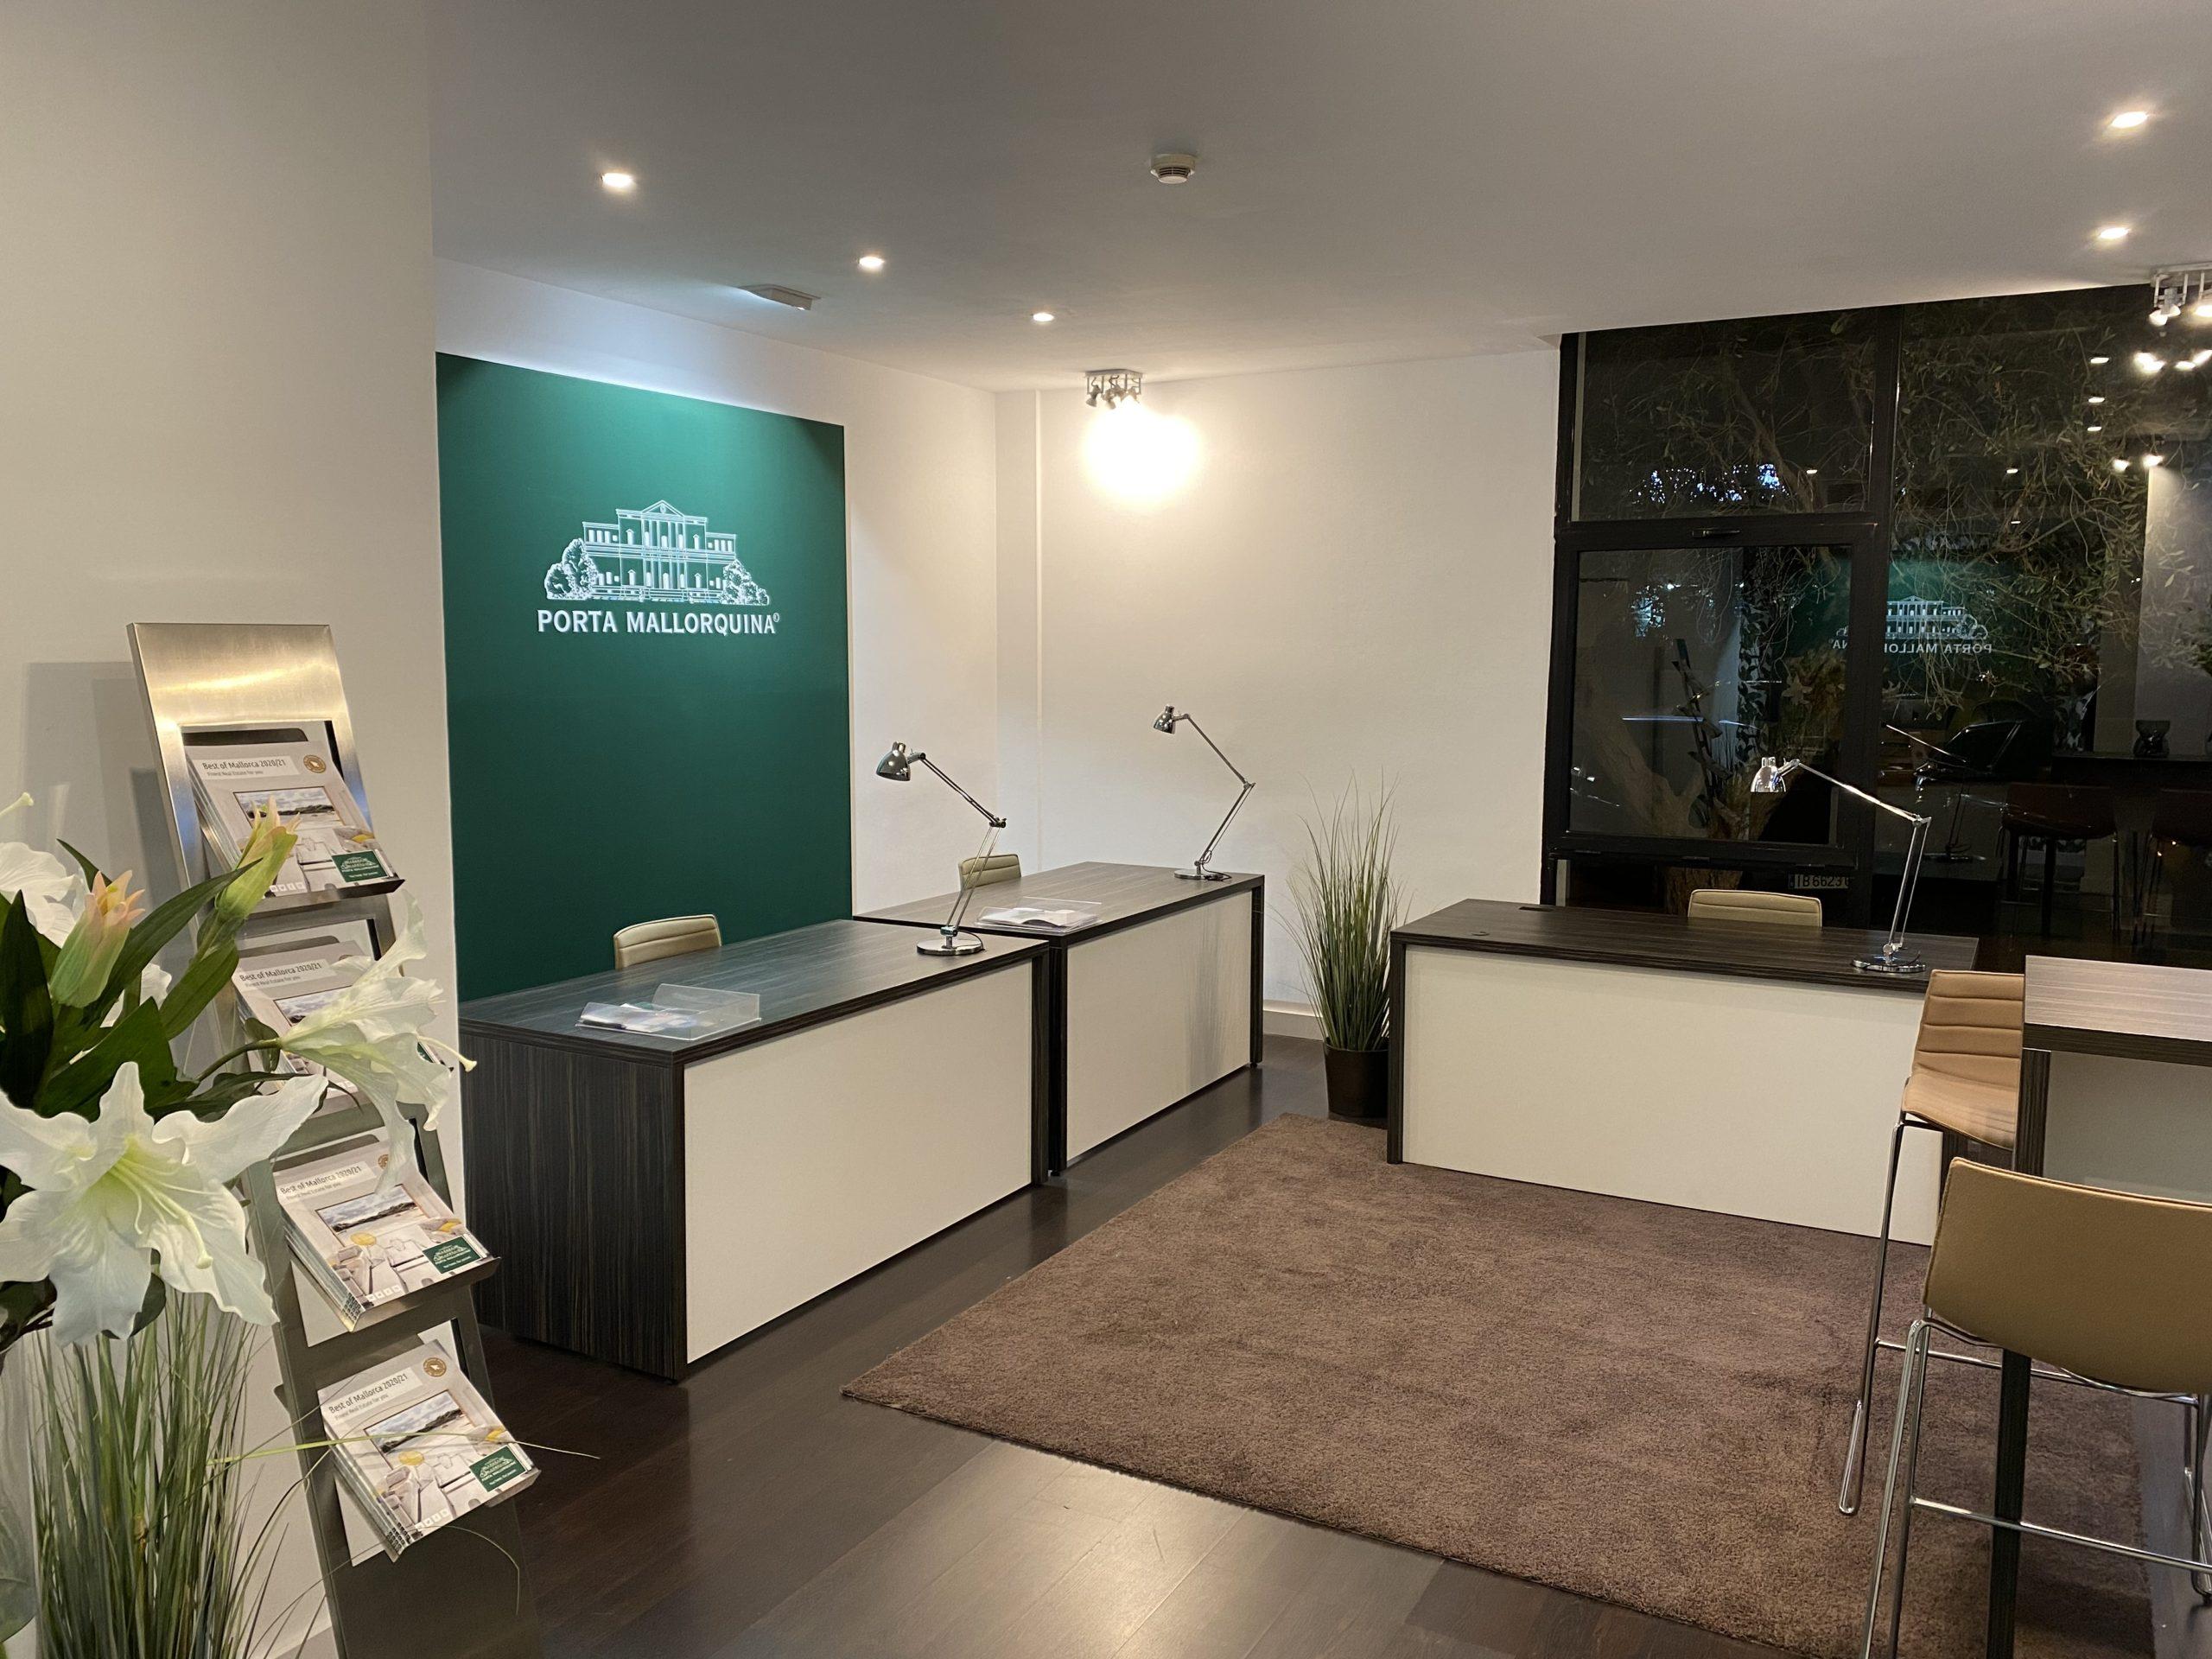 The new real estate shop from Porta Mallorquina in Santa Ponsa